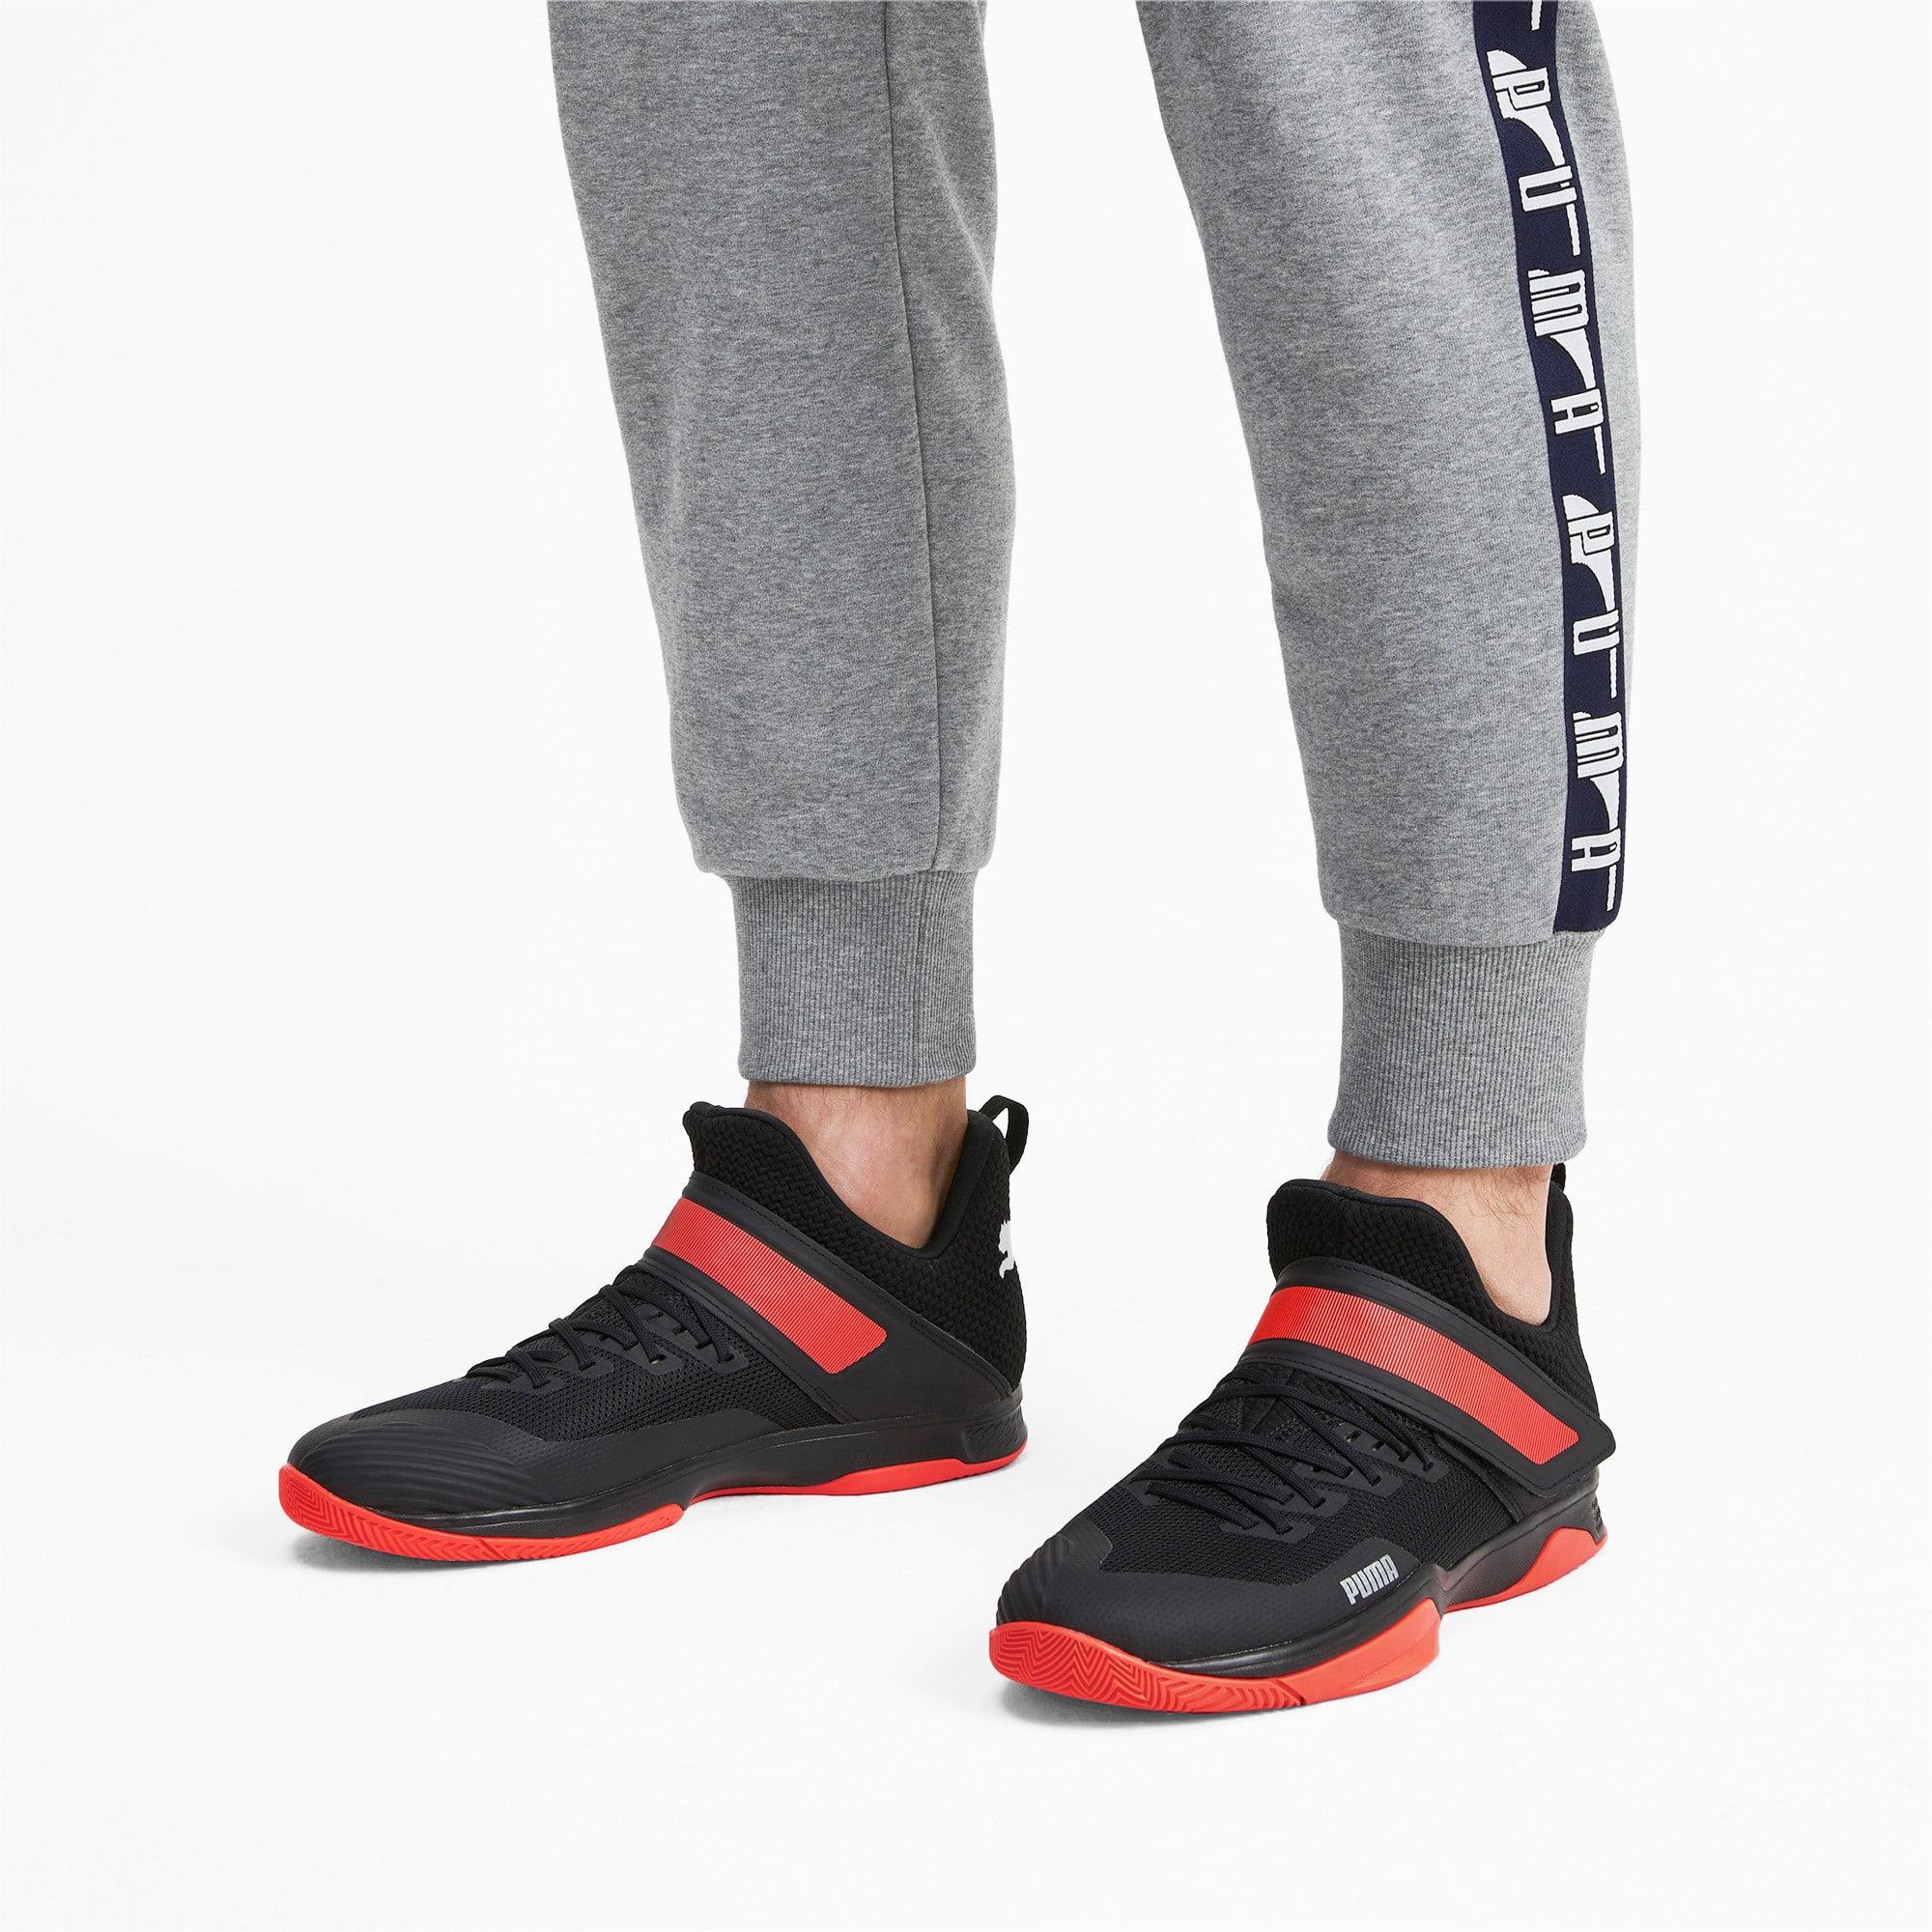 Thumbnail 2 of Rise XT3 Handball Shoes, Puma Black-Silver-Nrgy Red, medium